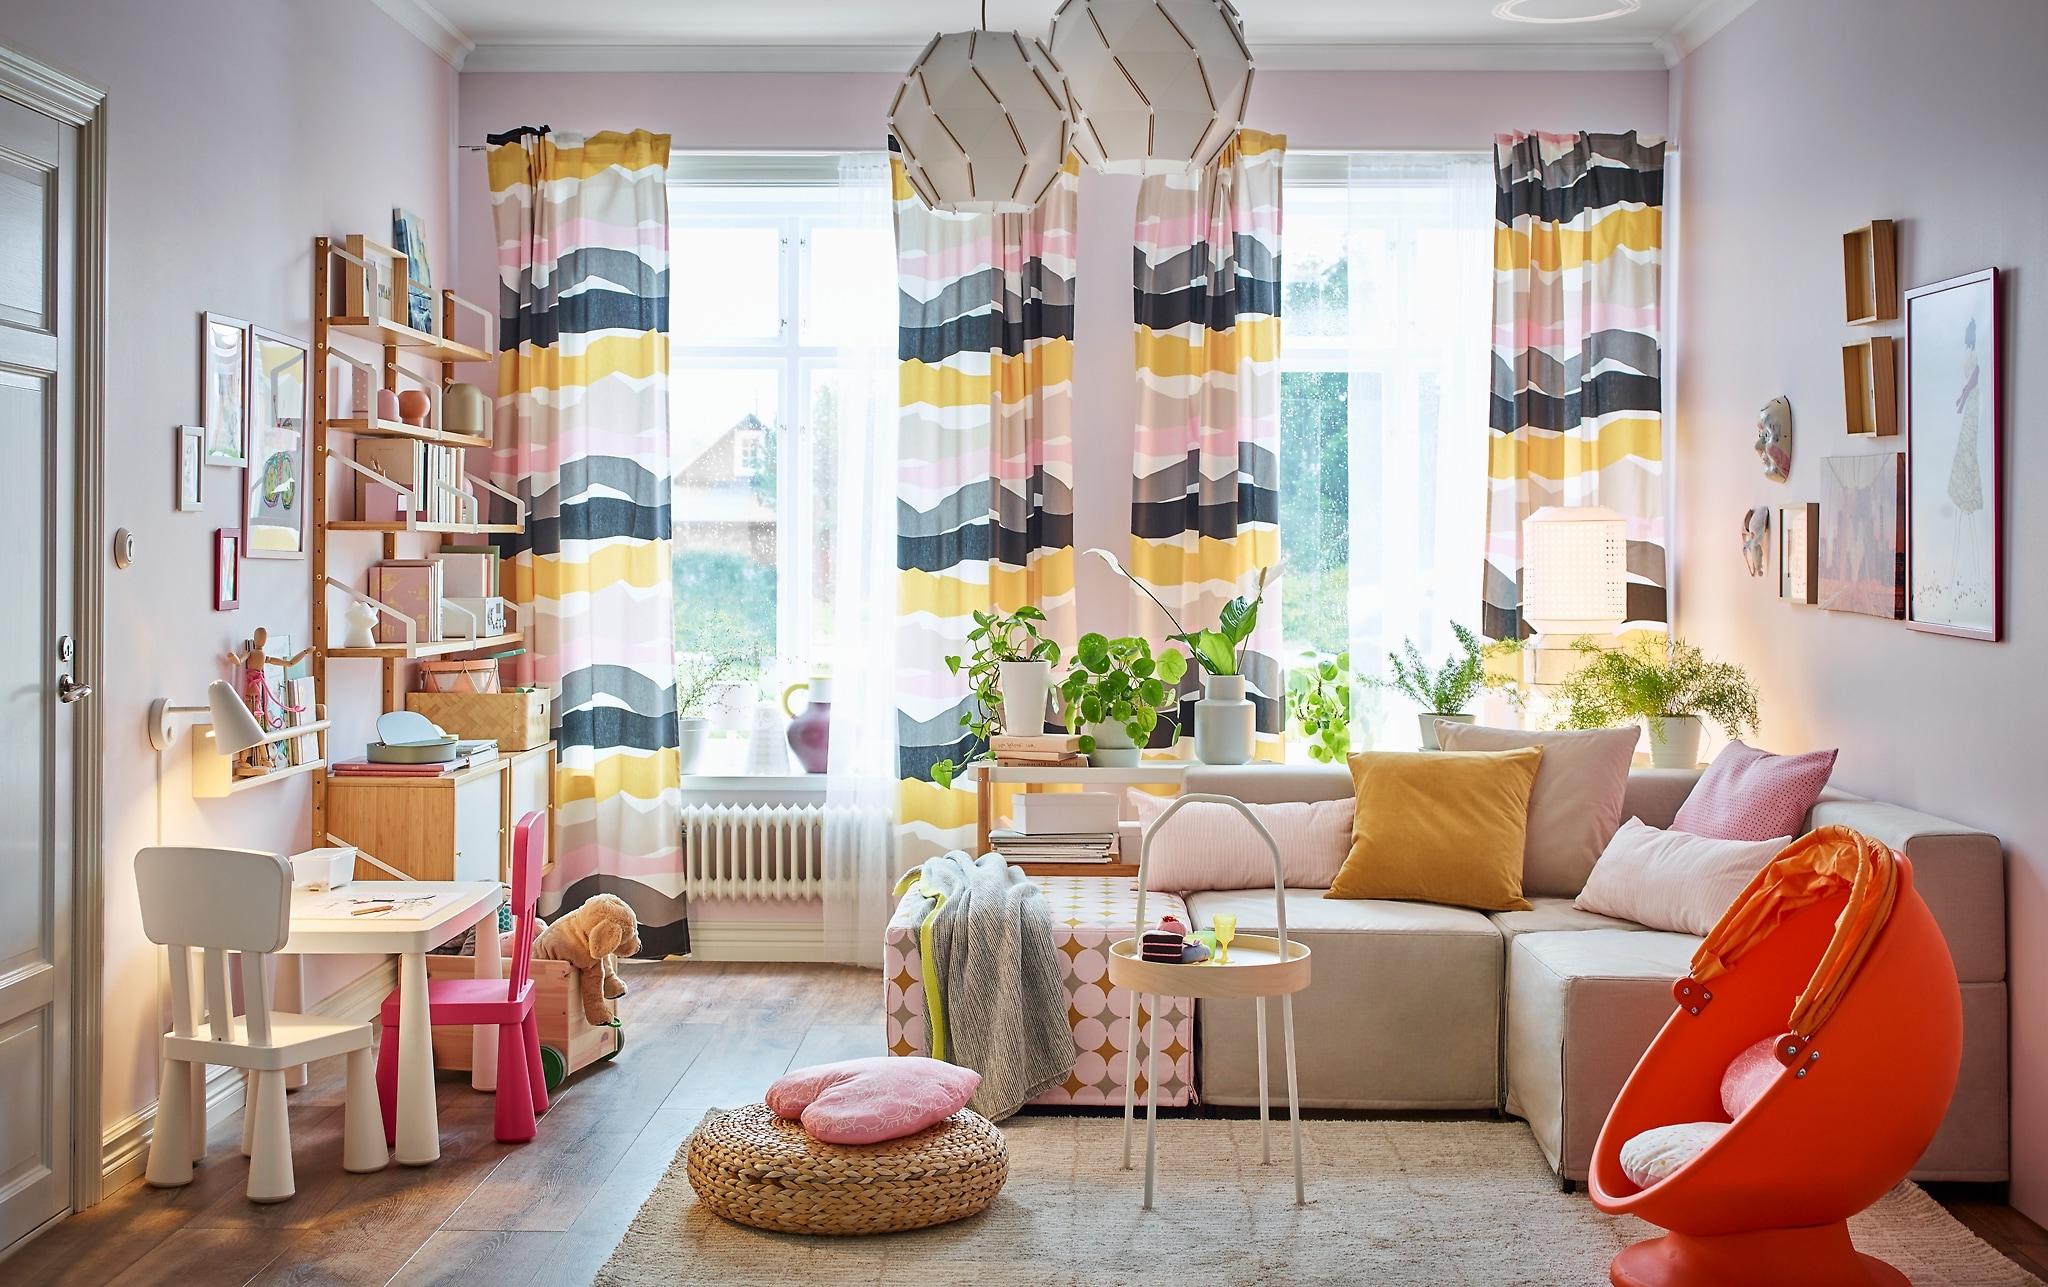 Amueblar Piso Completo Ikea H9d9 Salà N Muebles Para El Salà N Pra Online Ikea